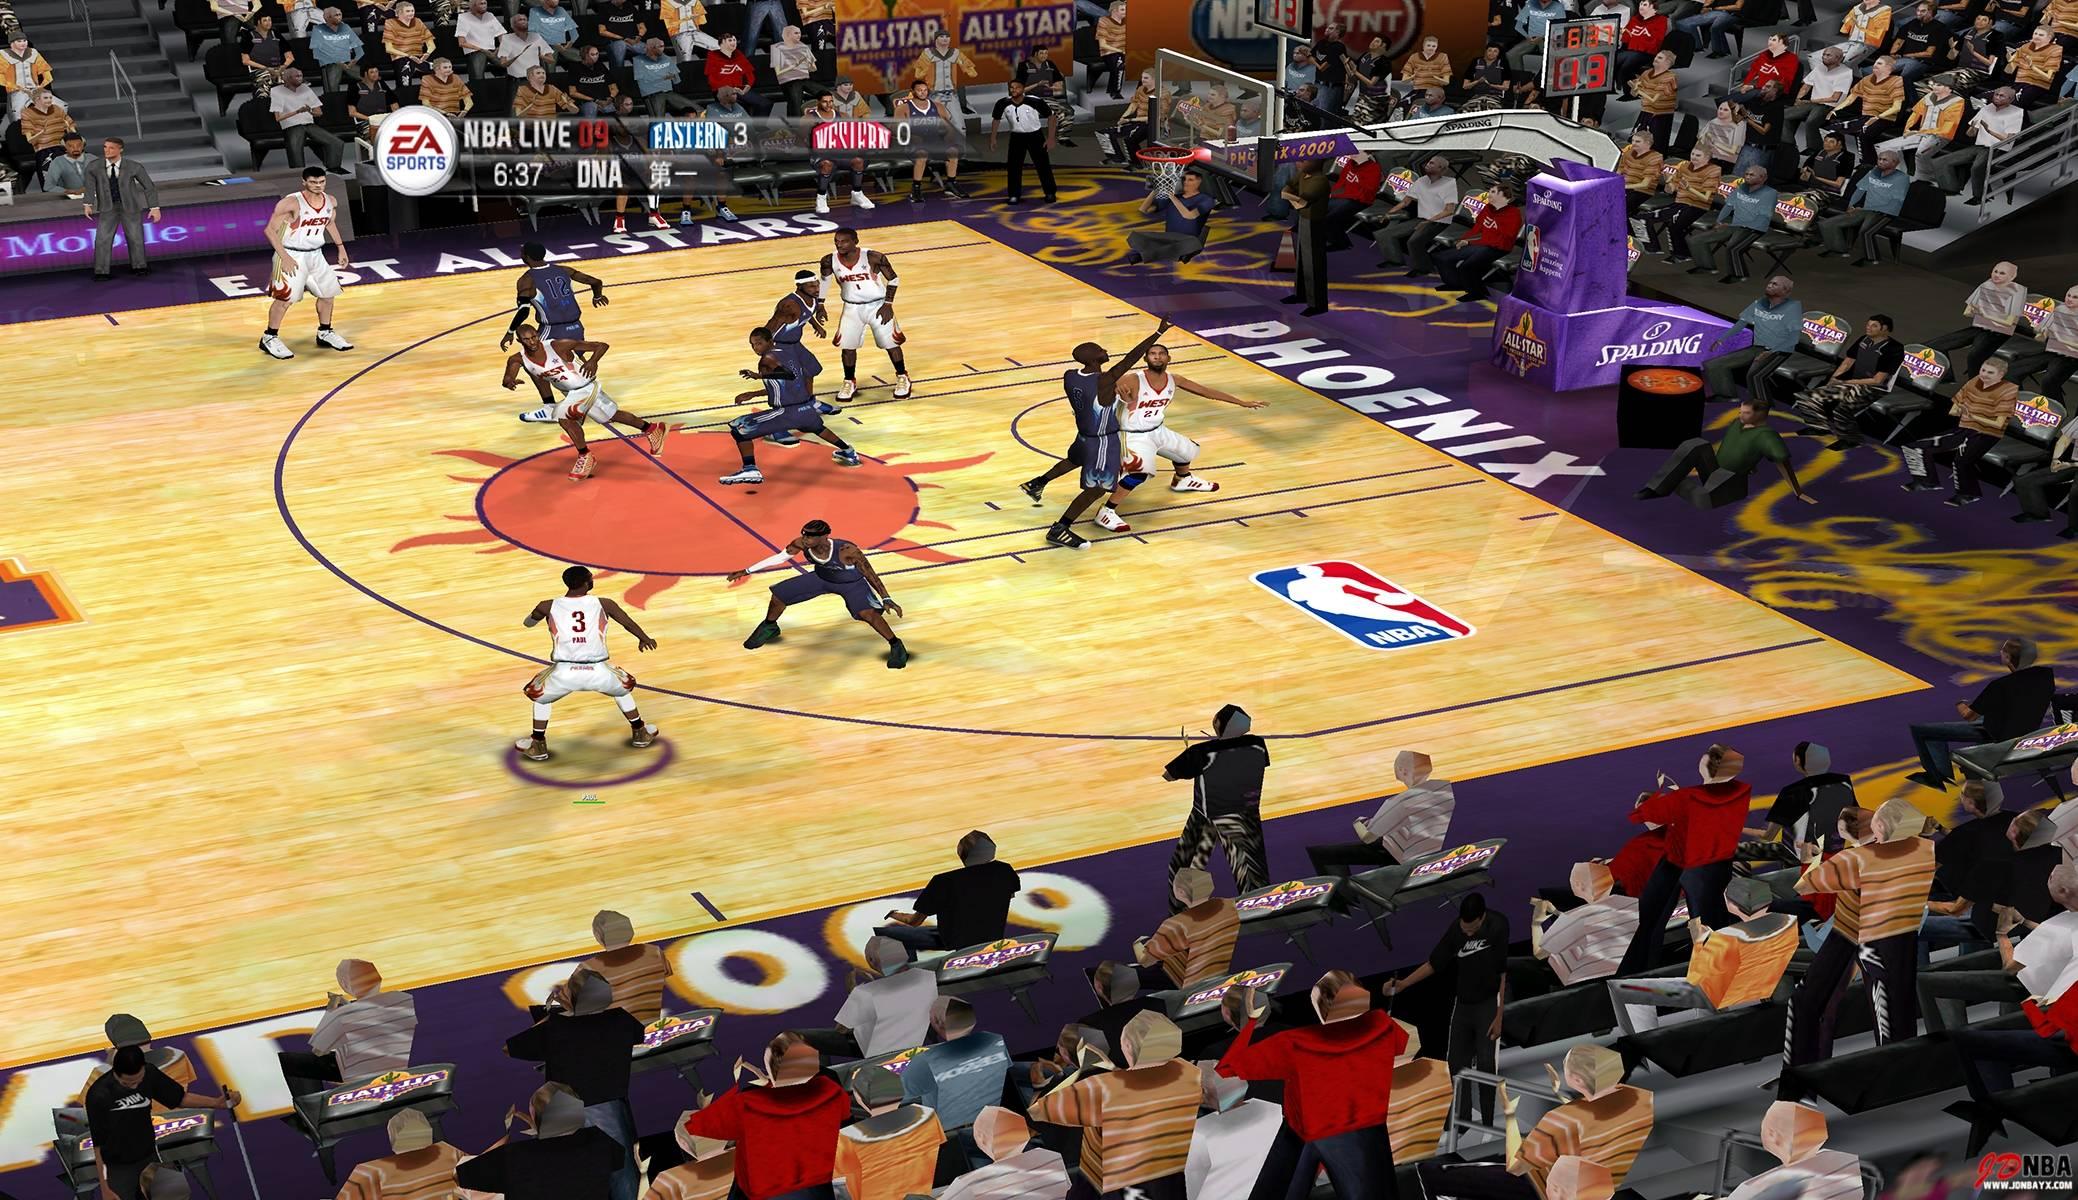 NBA LIVE 09【4K】-2021-08-29-01-13-43-953副本.jpg